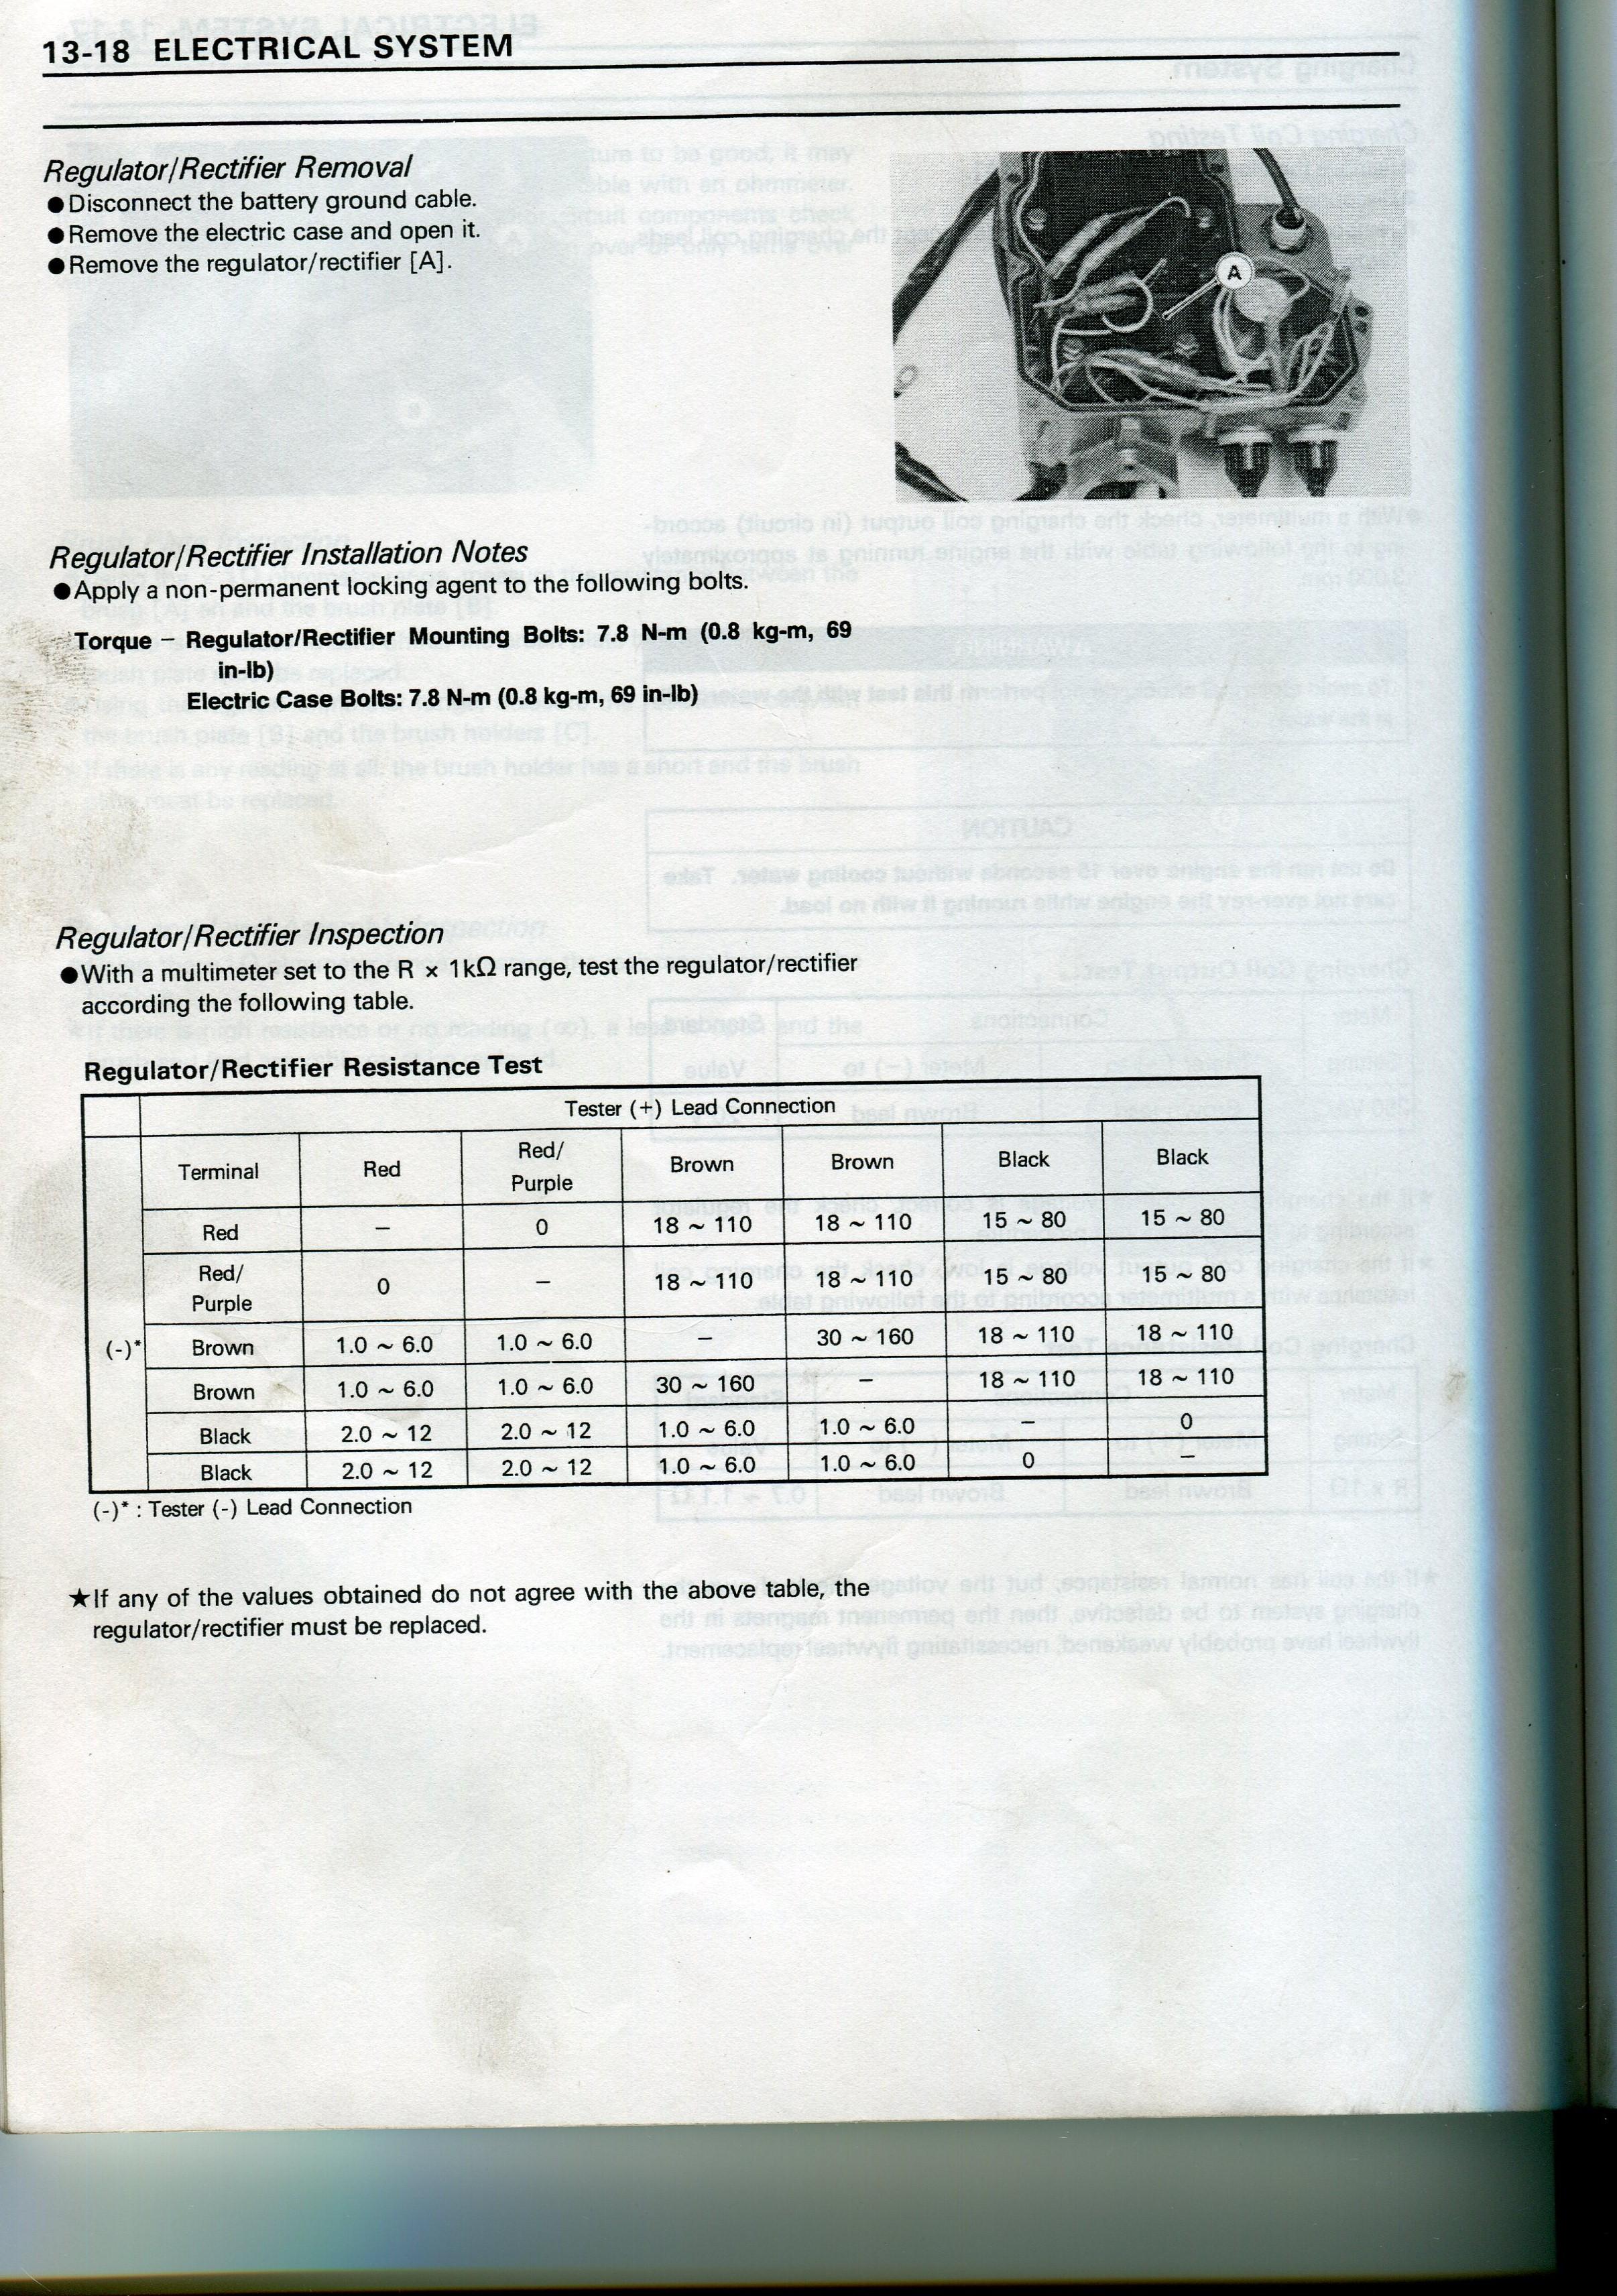 Sea Doo Boat Trailer Wiring Diagram 3 Movie Audio Songs In Telugu Ottawa Perth Powersports Marine Smiths Falls Kemptville Carleton Place Brockville On Dealer Used Atv Outboard Motor Snowmobile